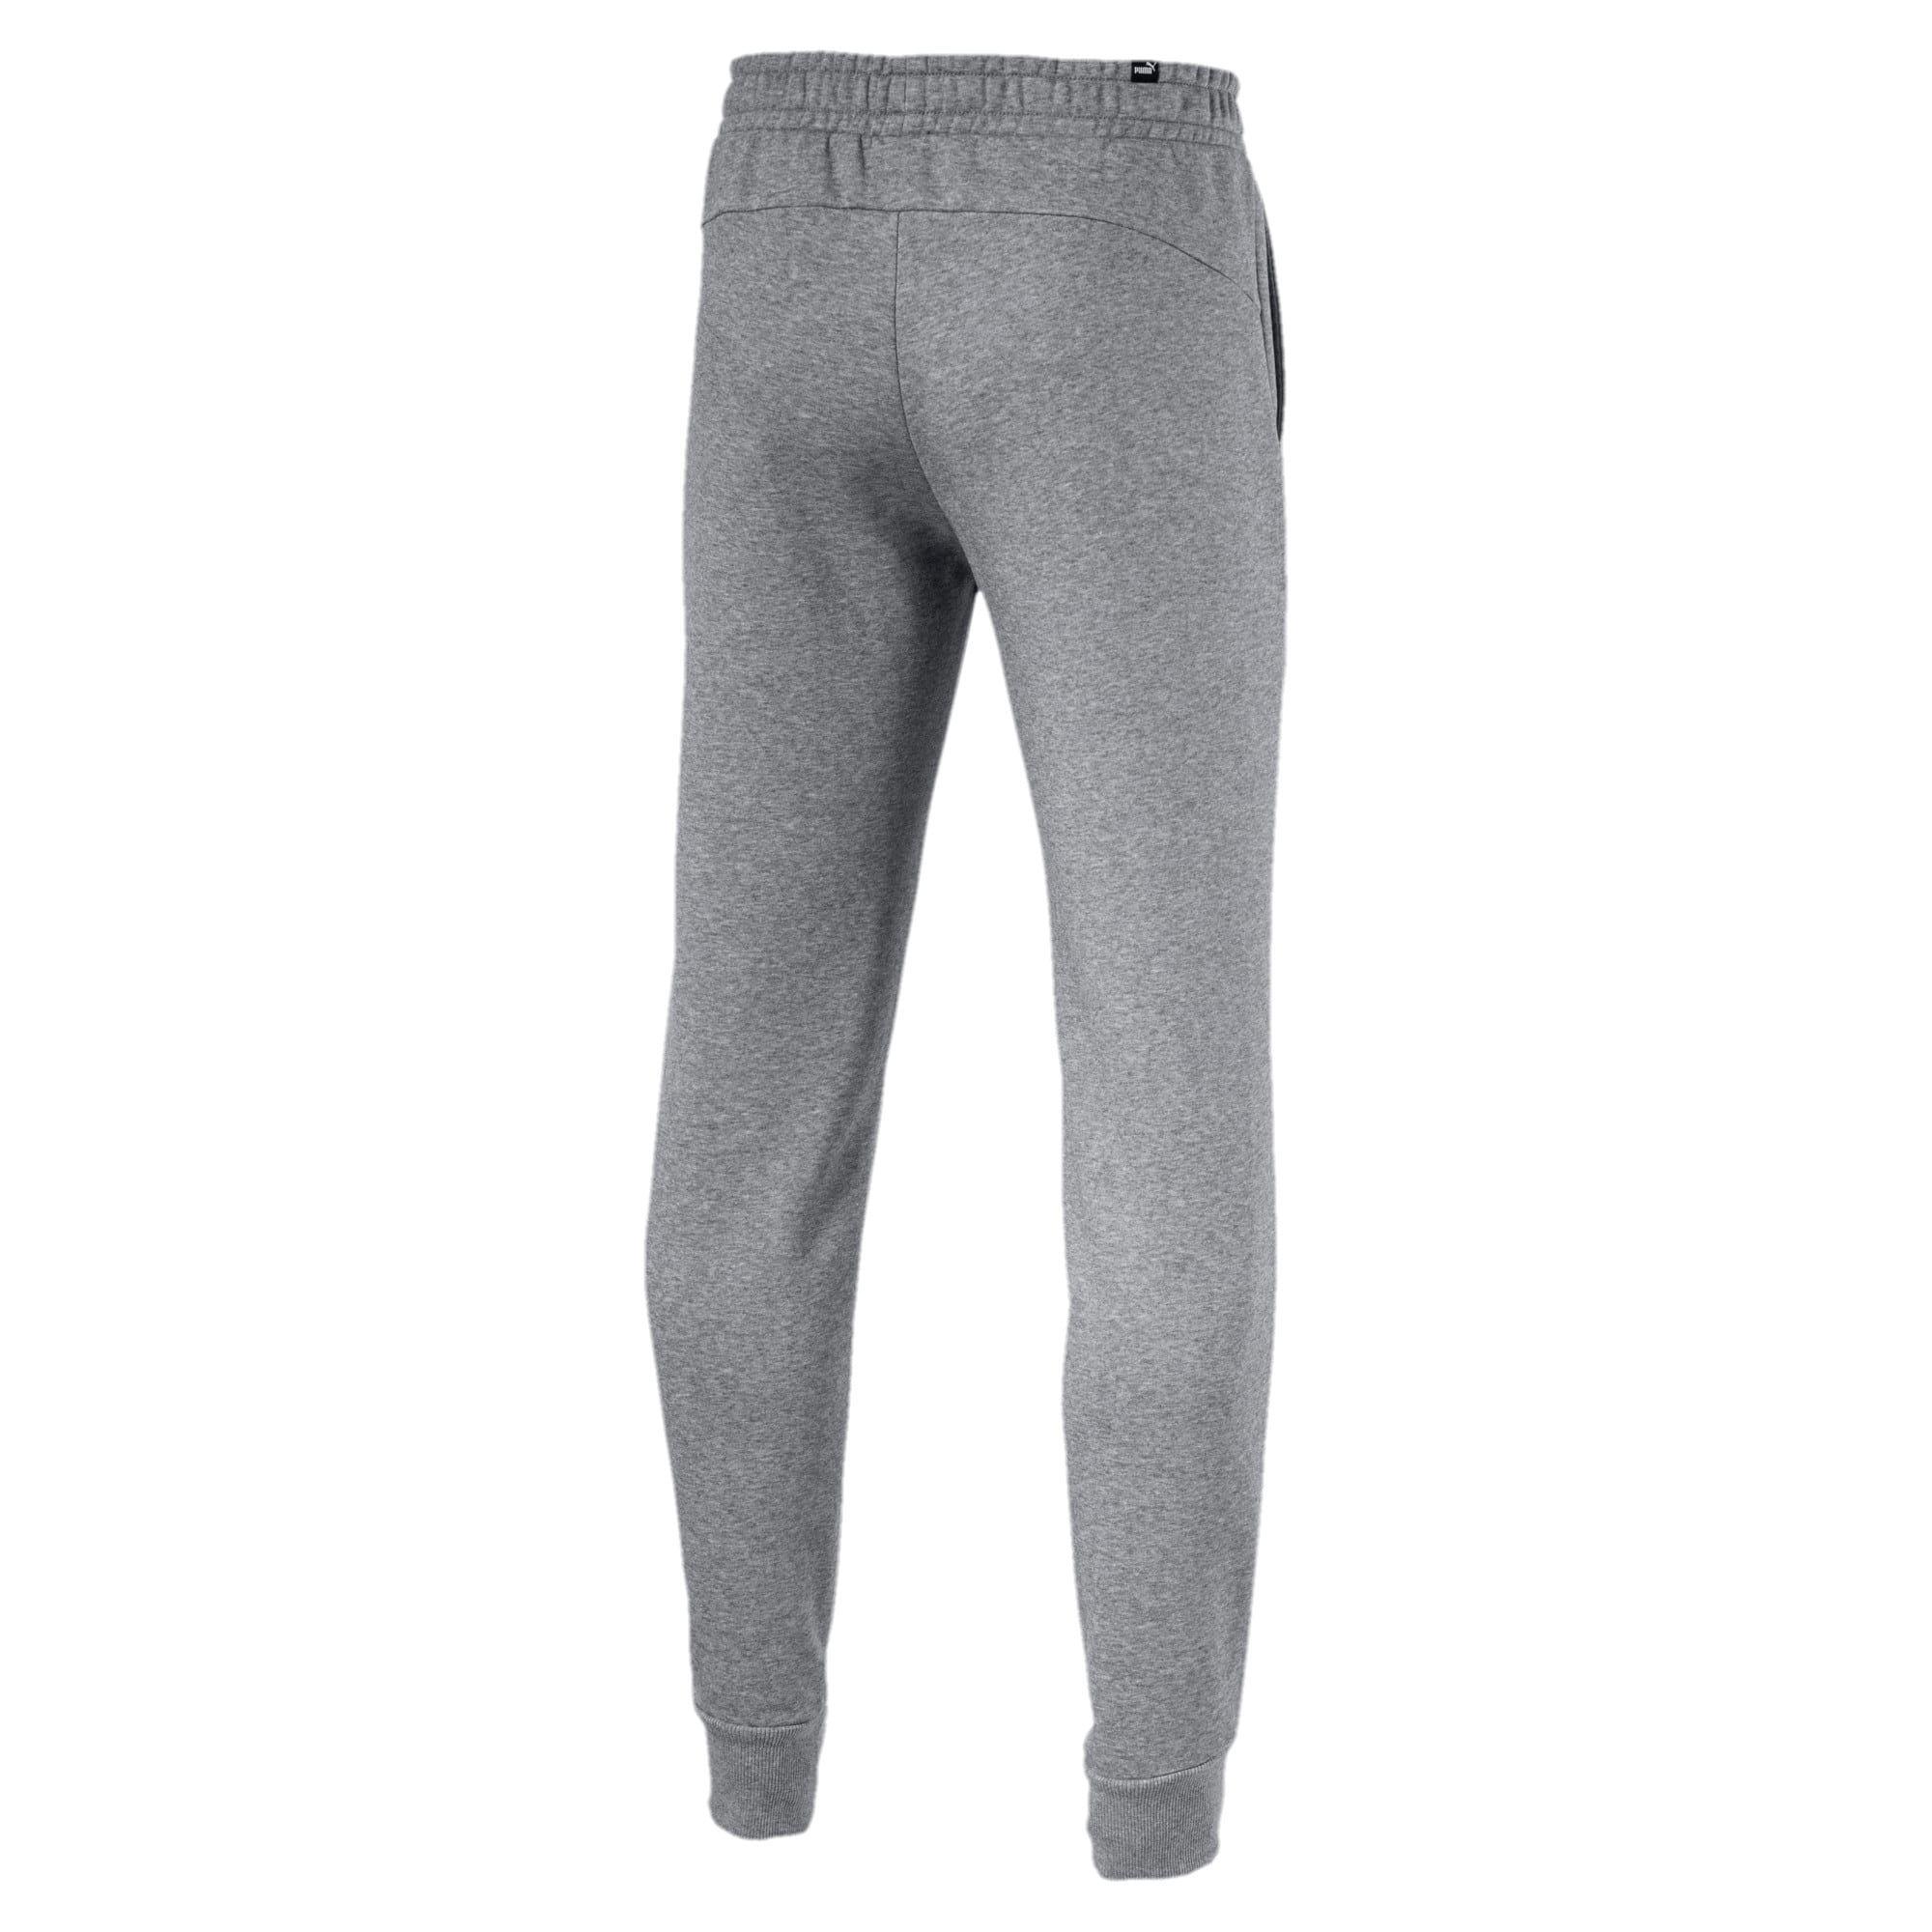 PUMA Essentials Men's Sweatpants in Medium Grey Heather size 2X Small #sweatpantsoutfit